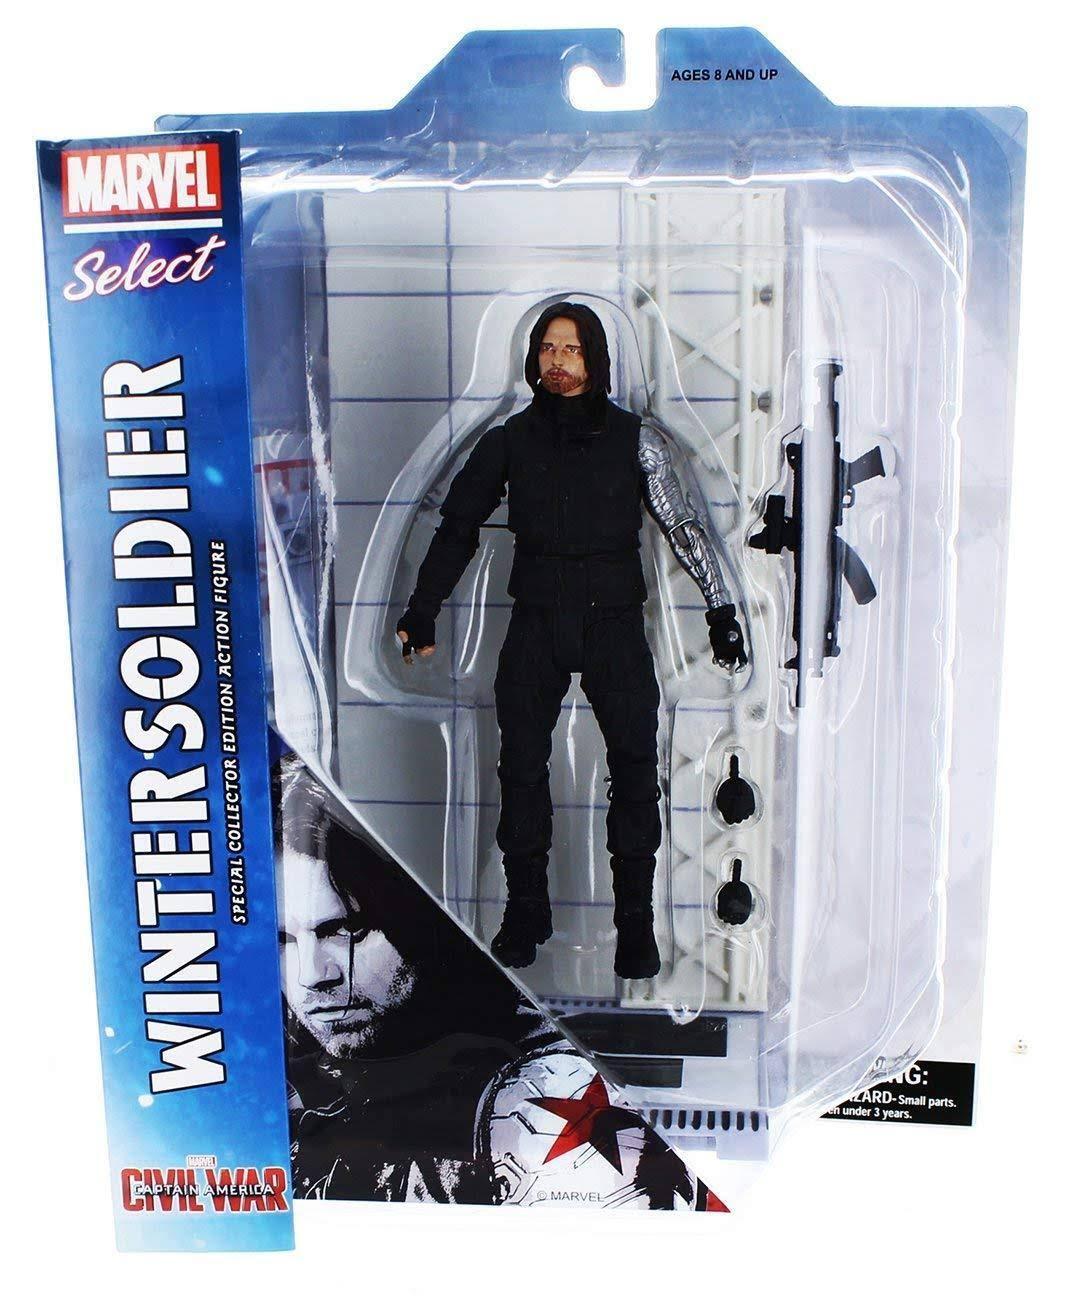 Marvel Select Captain America Civil War WINTER SOLDIER Diamond Diamond Diamond Select Avengers 22eaf0